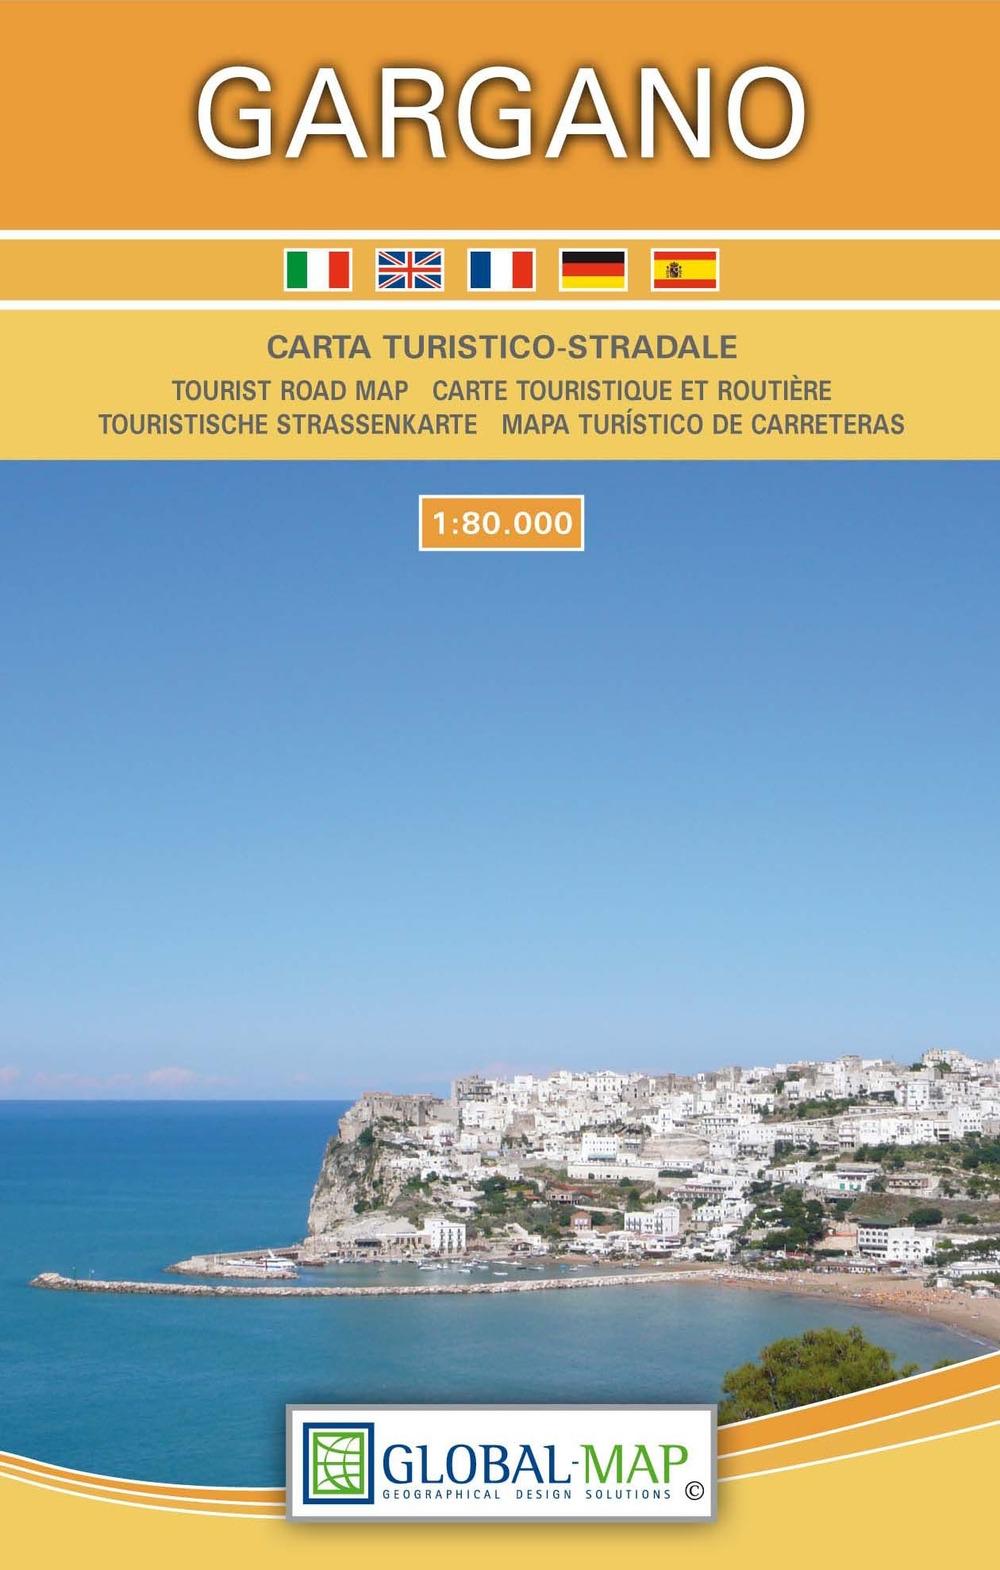 Gargano. Carta Turistico-Stradale. Tourist Road Map. Carte Touristique Et Routiere. Touristische Strassenkarte. Mapa Turistico De Carreteras